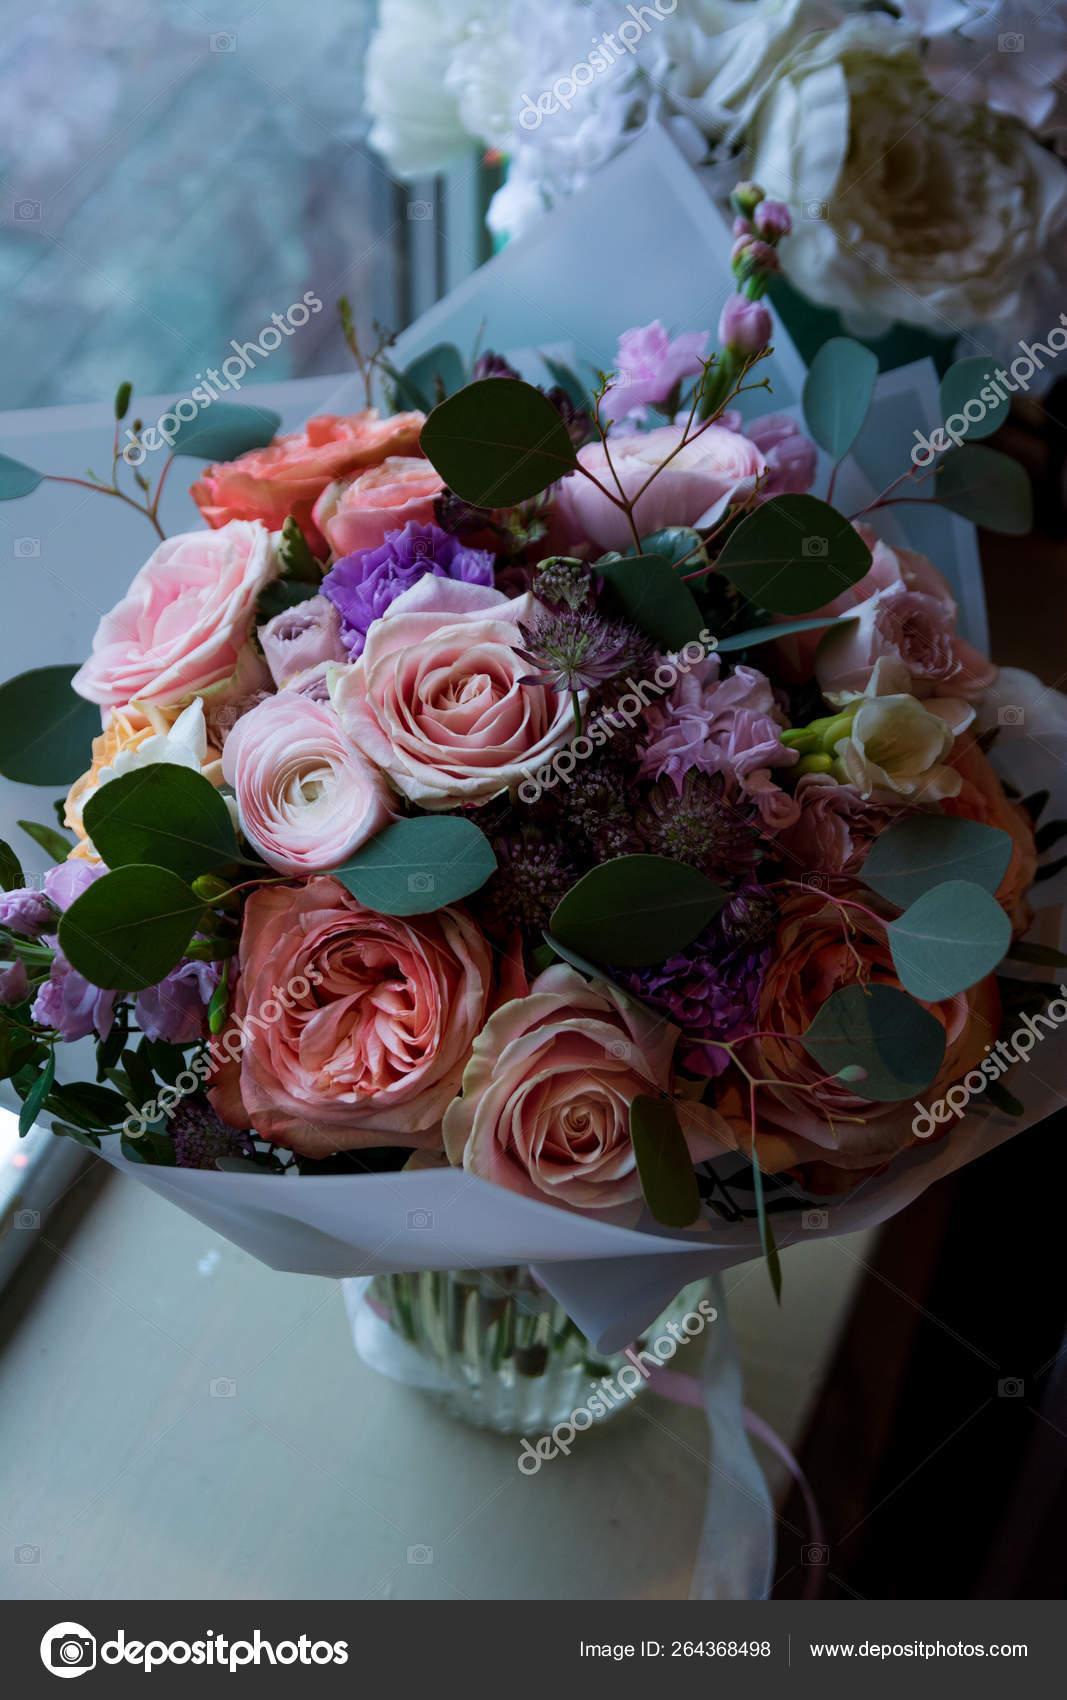 Bouquet Flowers Wedding Salon Roses Anemone Tulip Ranunculus Sunflower Garden Stock Photo C Plan905 264368498